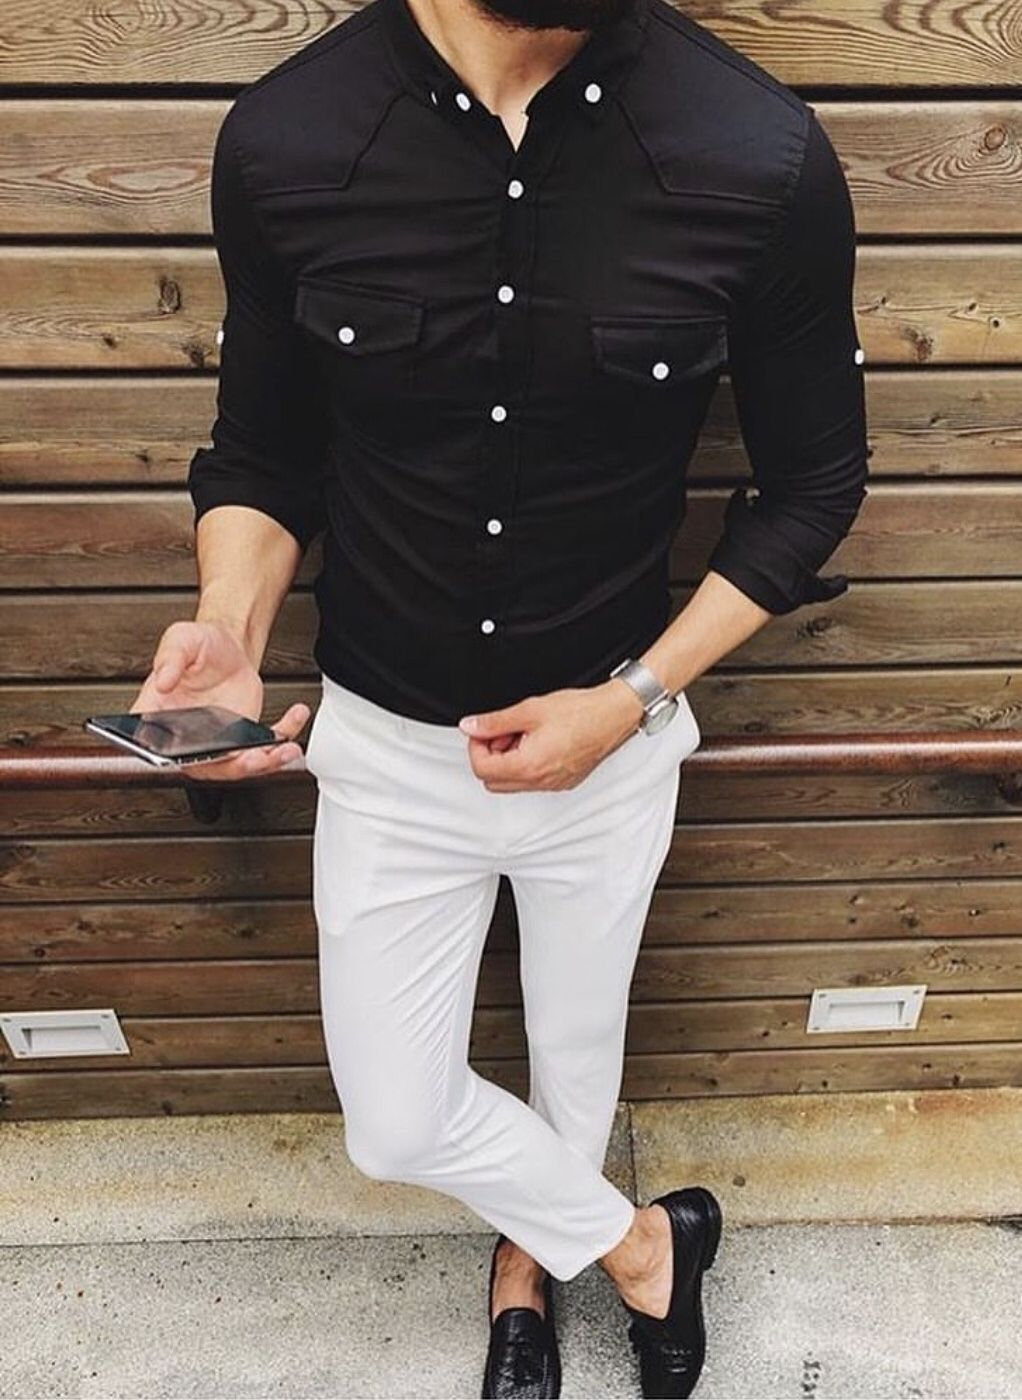 Custom Shirts | Mens dress shirts outfit, Mens shirt dress, Black button  down shirt